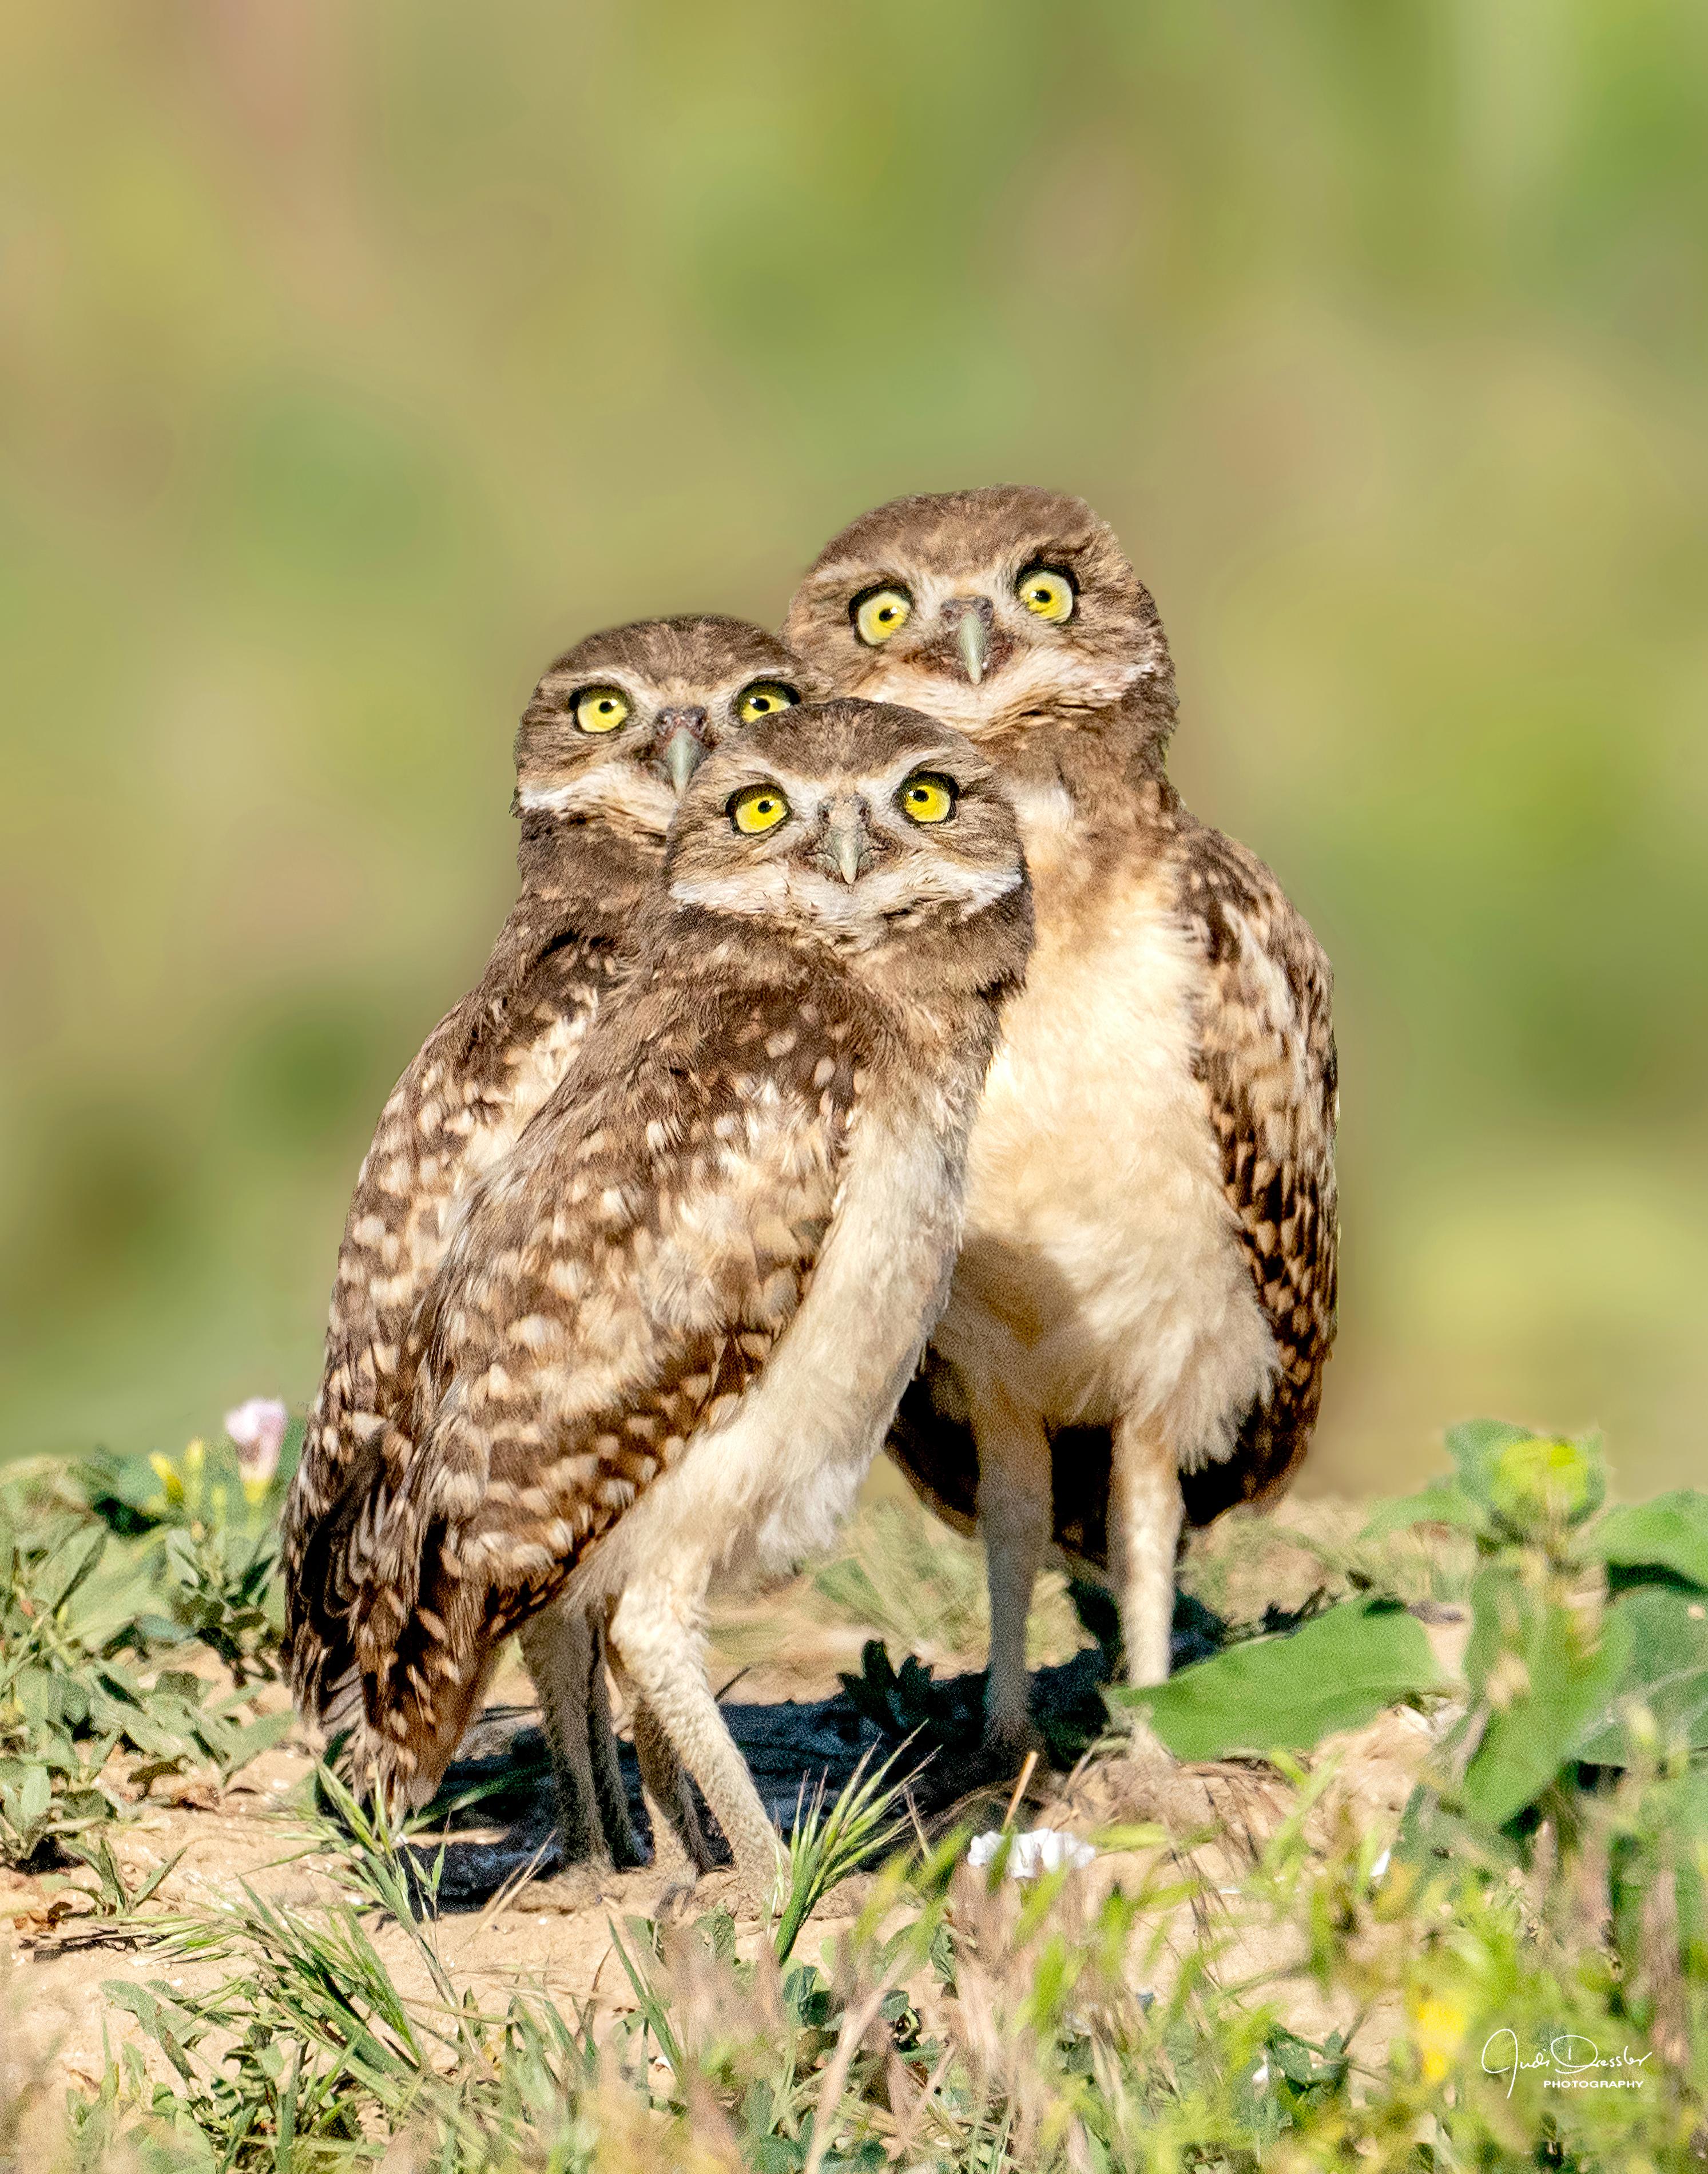 It's a plane, it's a bug, it's a bird -- burrowing owl babies, owls